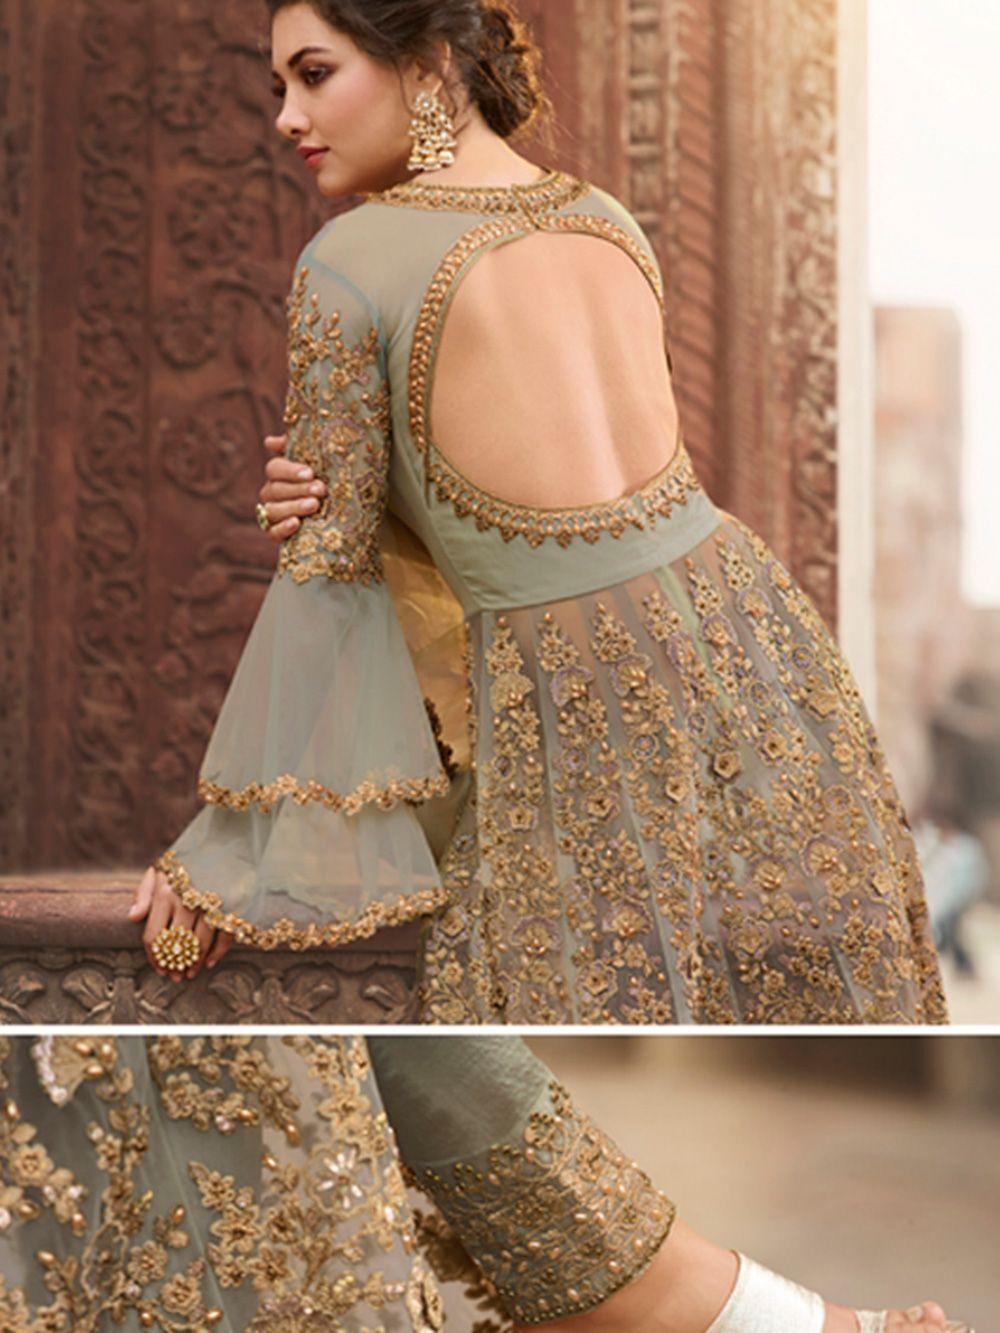 Wedding Punjabi Suit Lehenga Bridal Wear Gown Green Embroidered Ethnic Indian Pakistani Salwar Kameez Anarkali Suit Party Wear Kurti